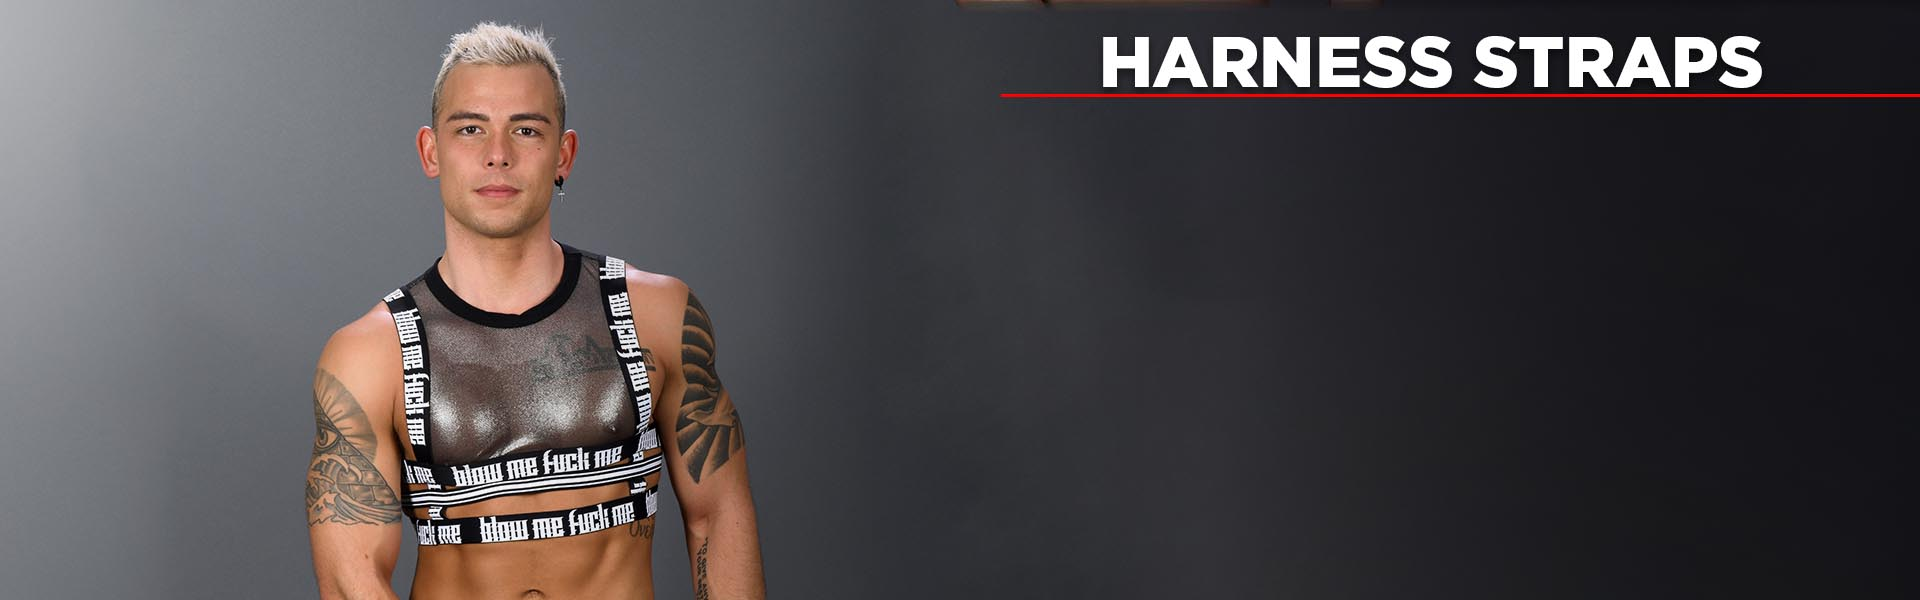 Harness Straps